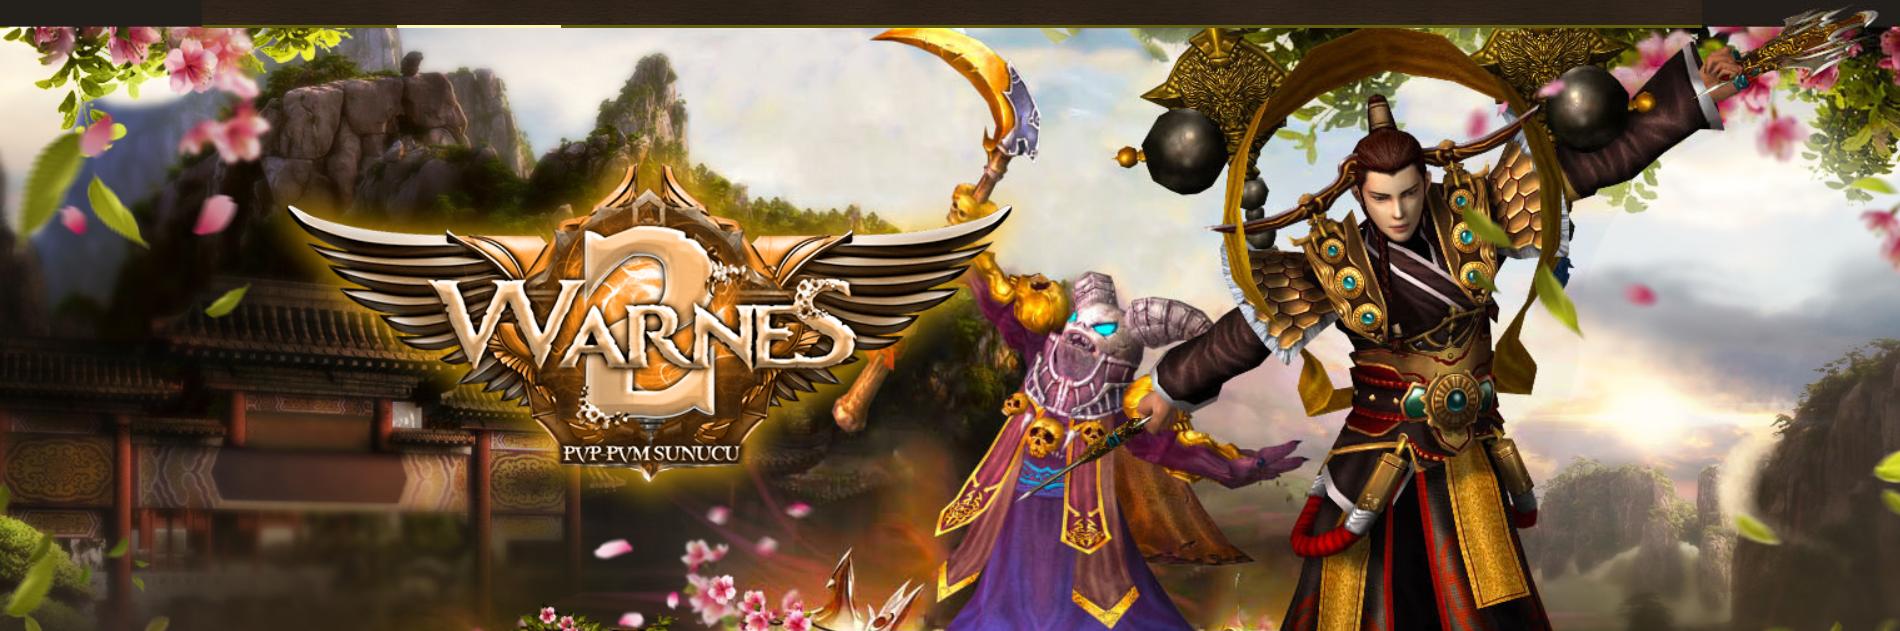 warnes2 logo.png